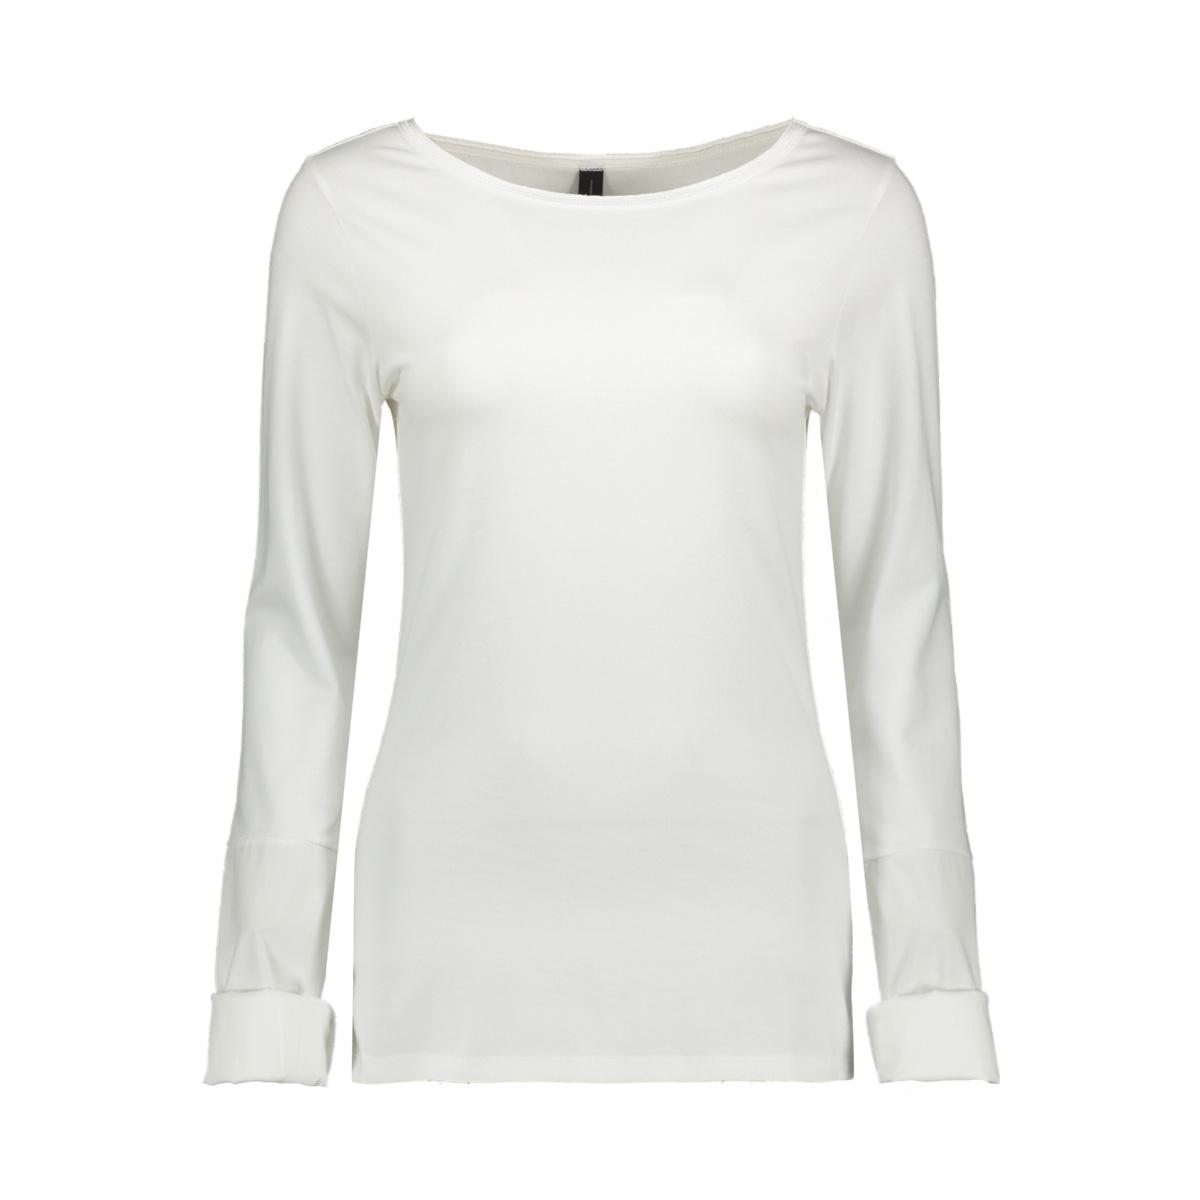 boatneck tee poplin 20 778 9103 10 days t-shirt white